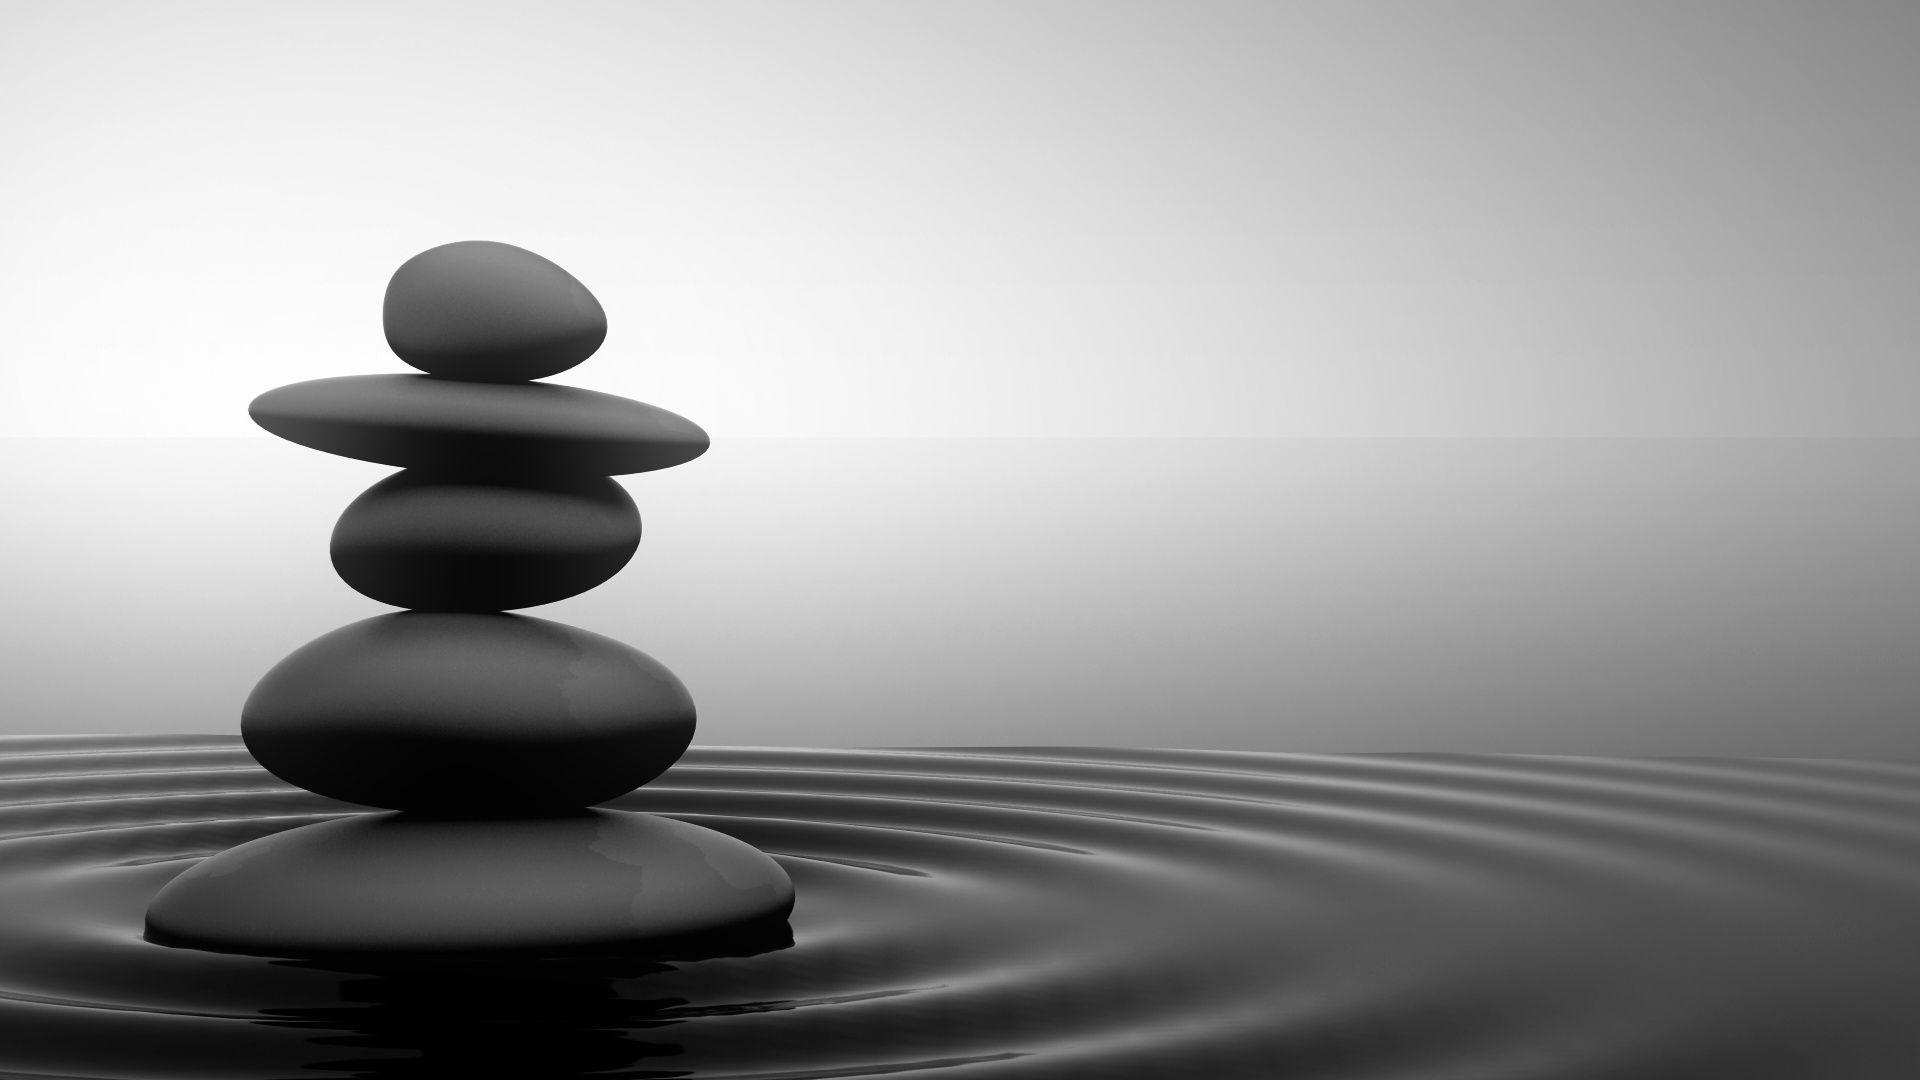 Black And White Zen Stone Water Grey Calm Serenity Zen